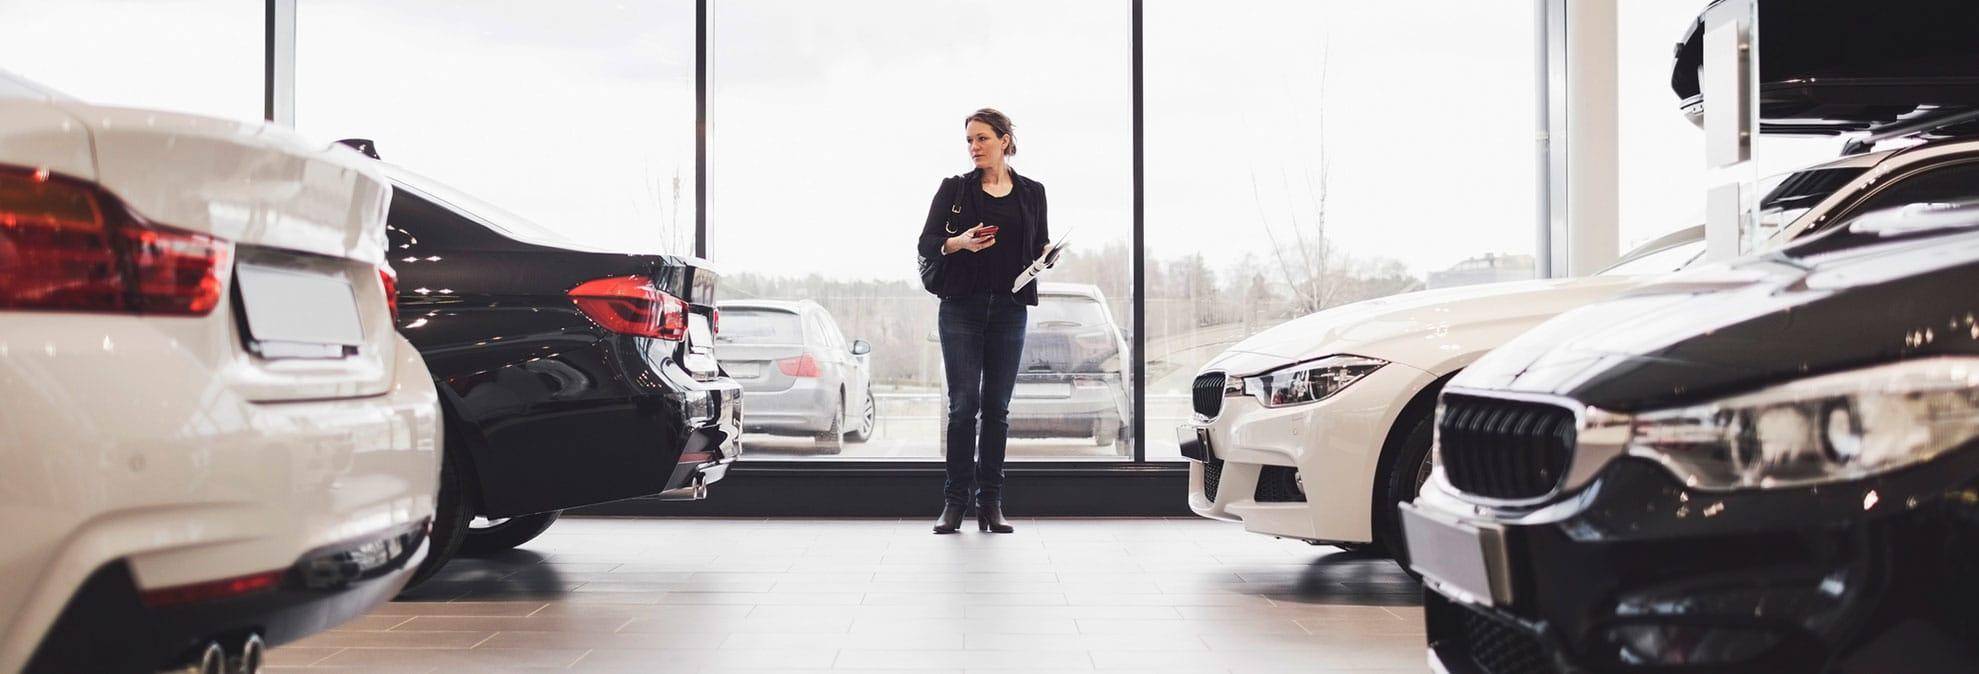 CR-Cars-Hero-Build-Buy-Car-Buying-0617